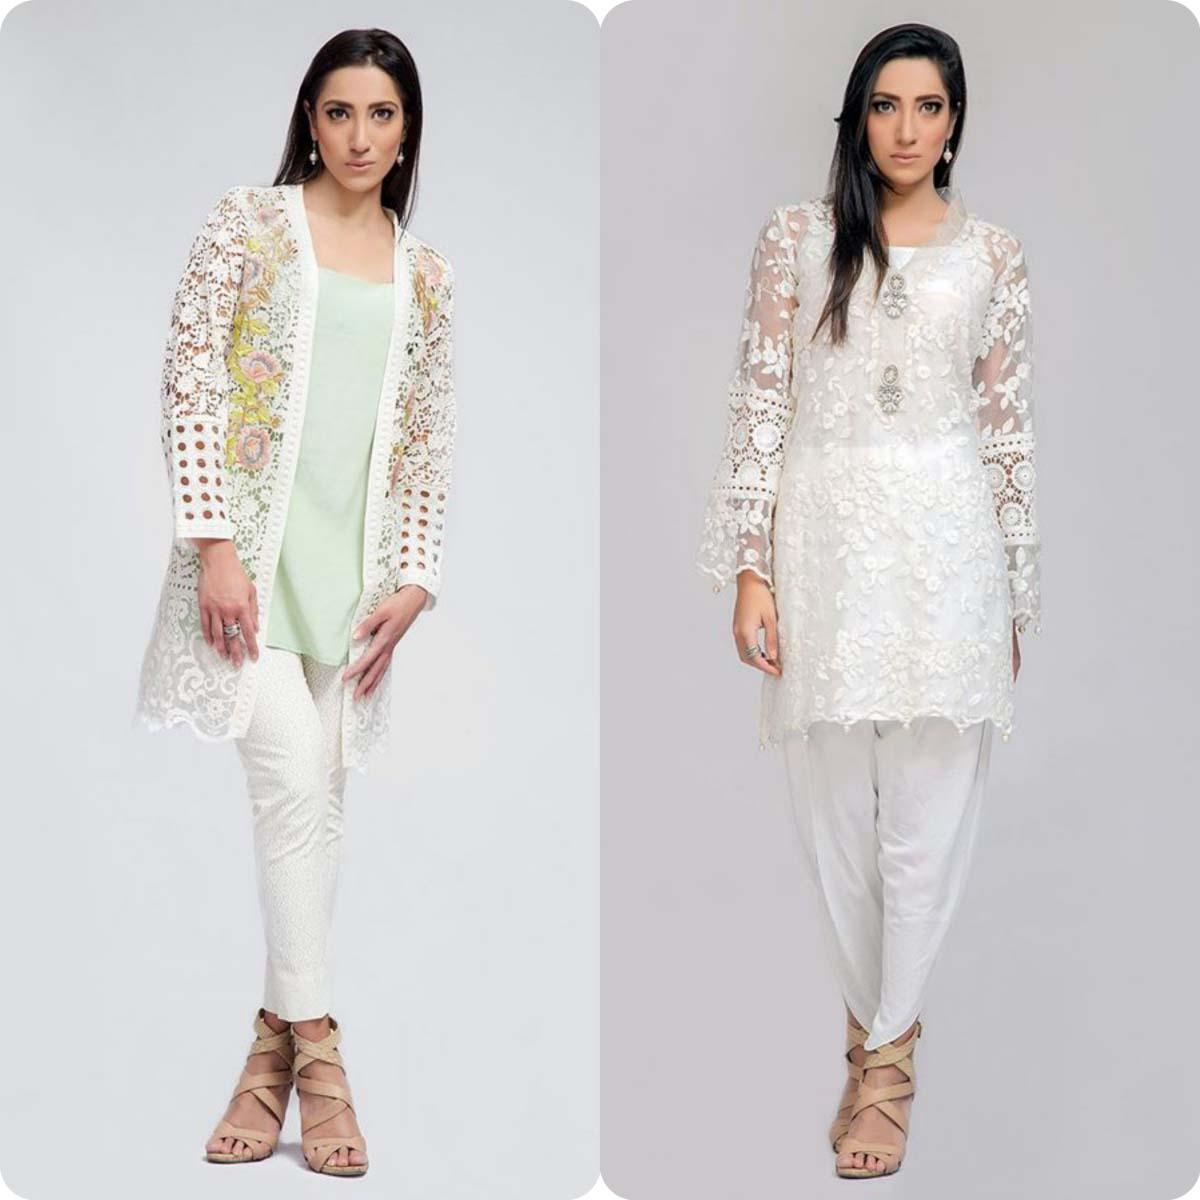 Deepak perwani Luxury Pret Eid Collection for Men and Women 2016-2017 (18)